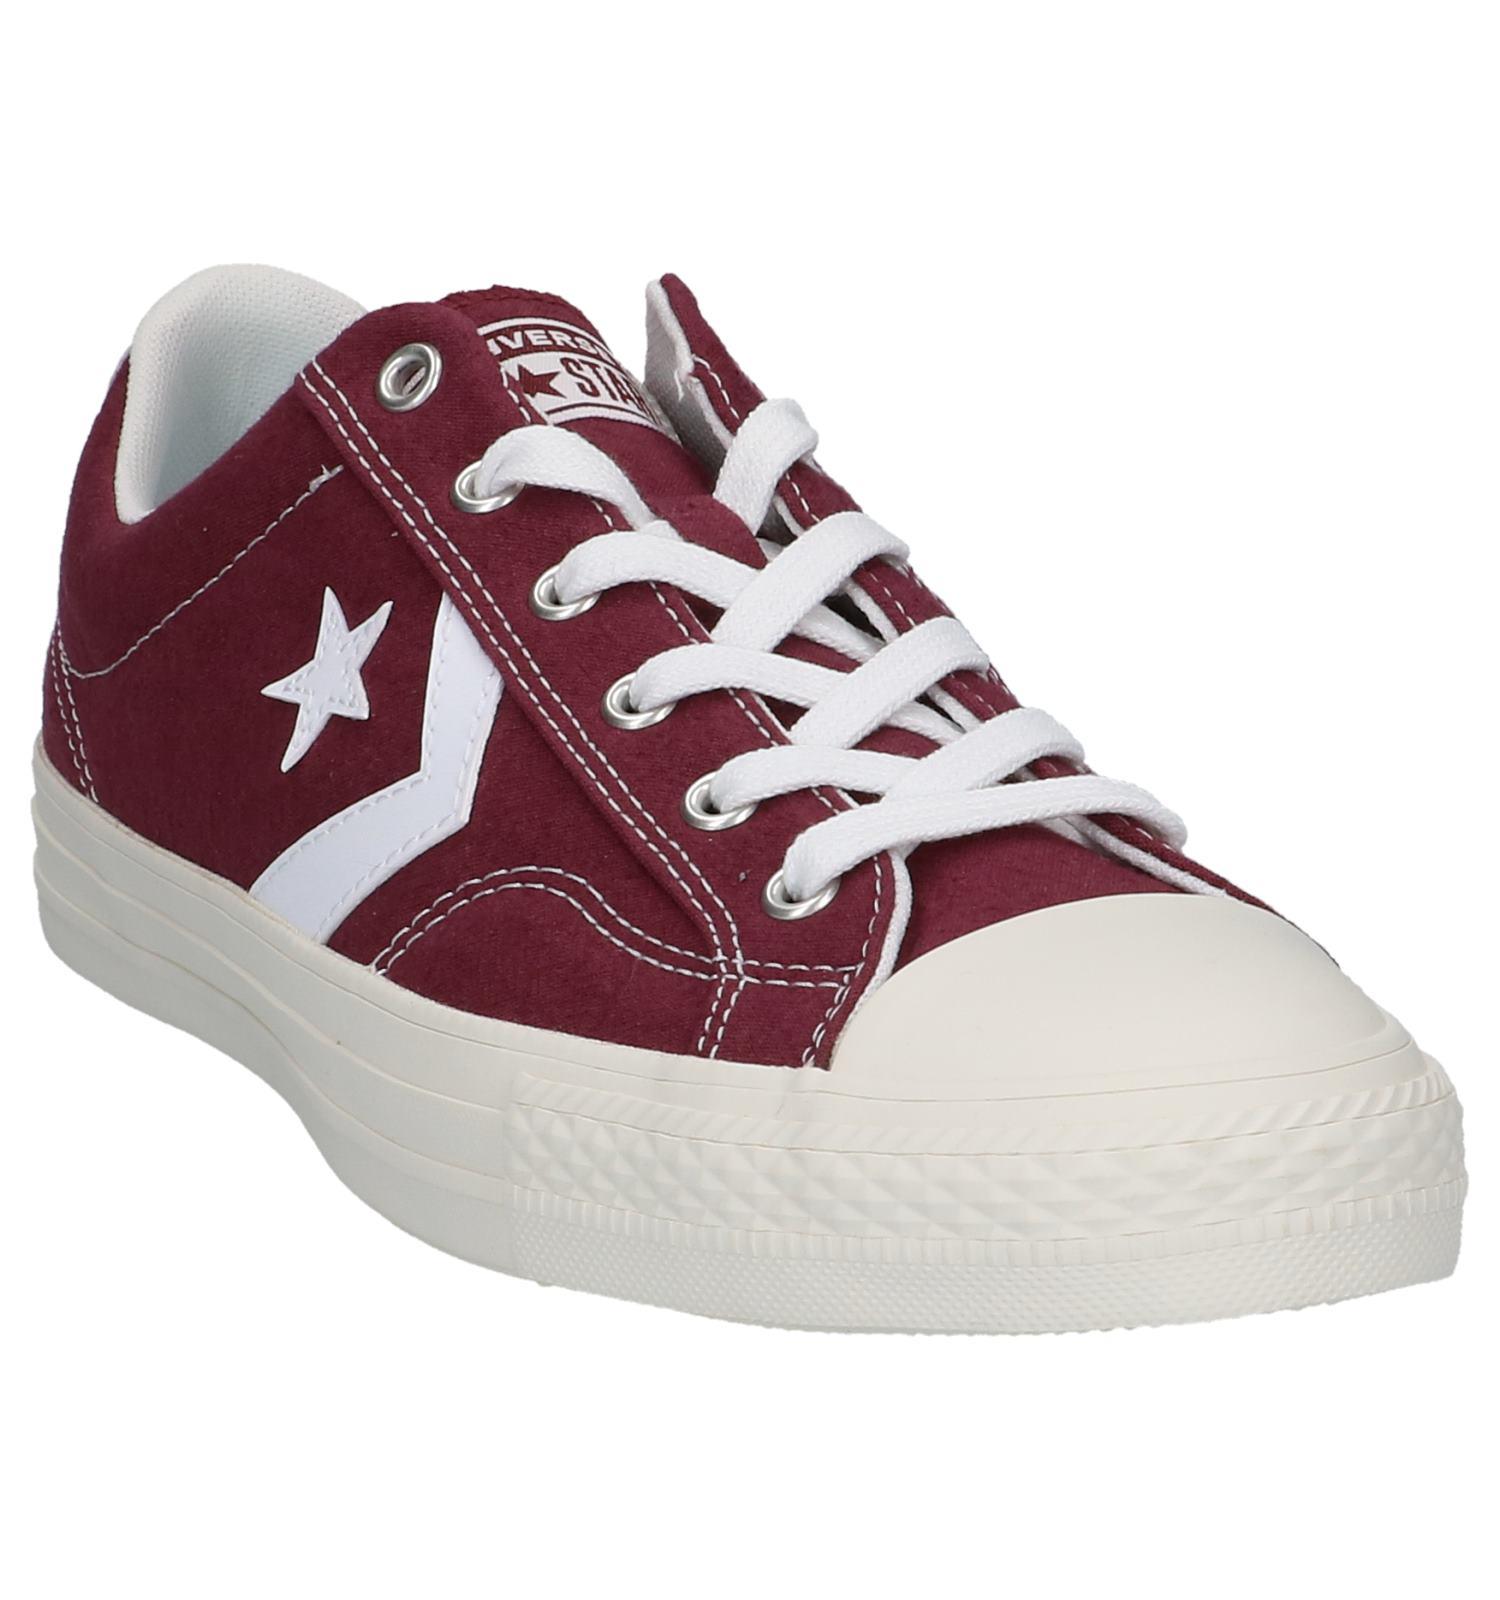 Bordeaux Sneakers Star Converse Sneakers Converse Player Bordeaux Player Star jSVpGMLUzq